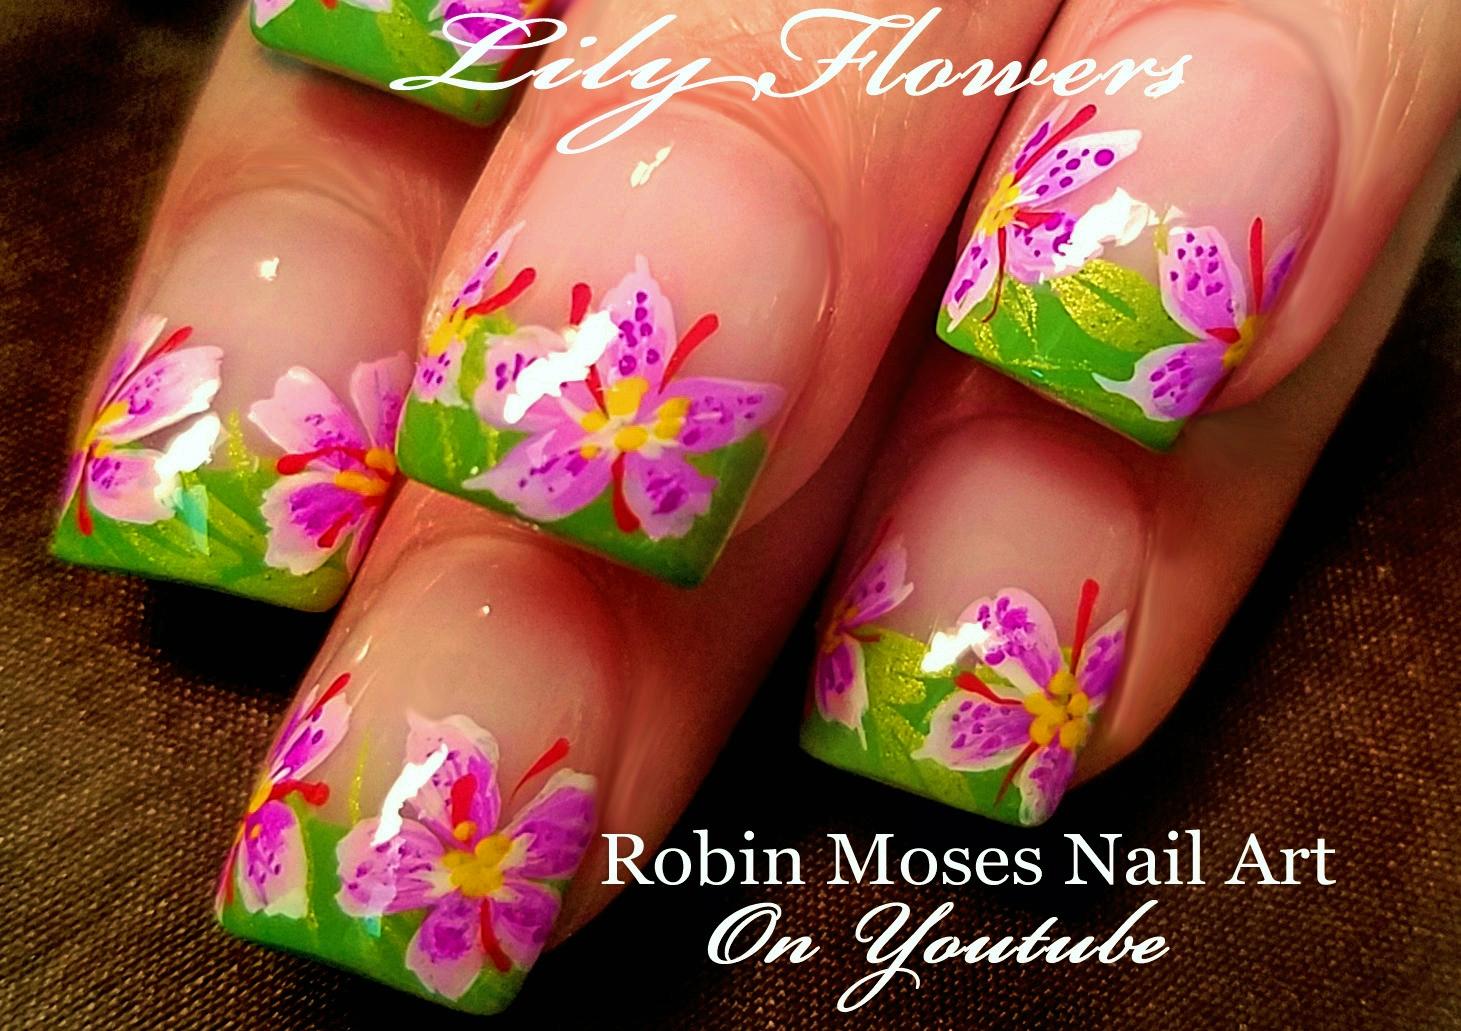 Robin Moses Nail Art: Lily Flower Nail Art Design Tutorial ...